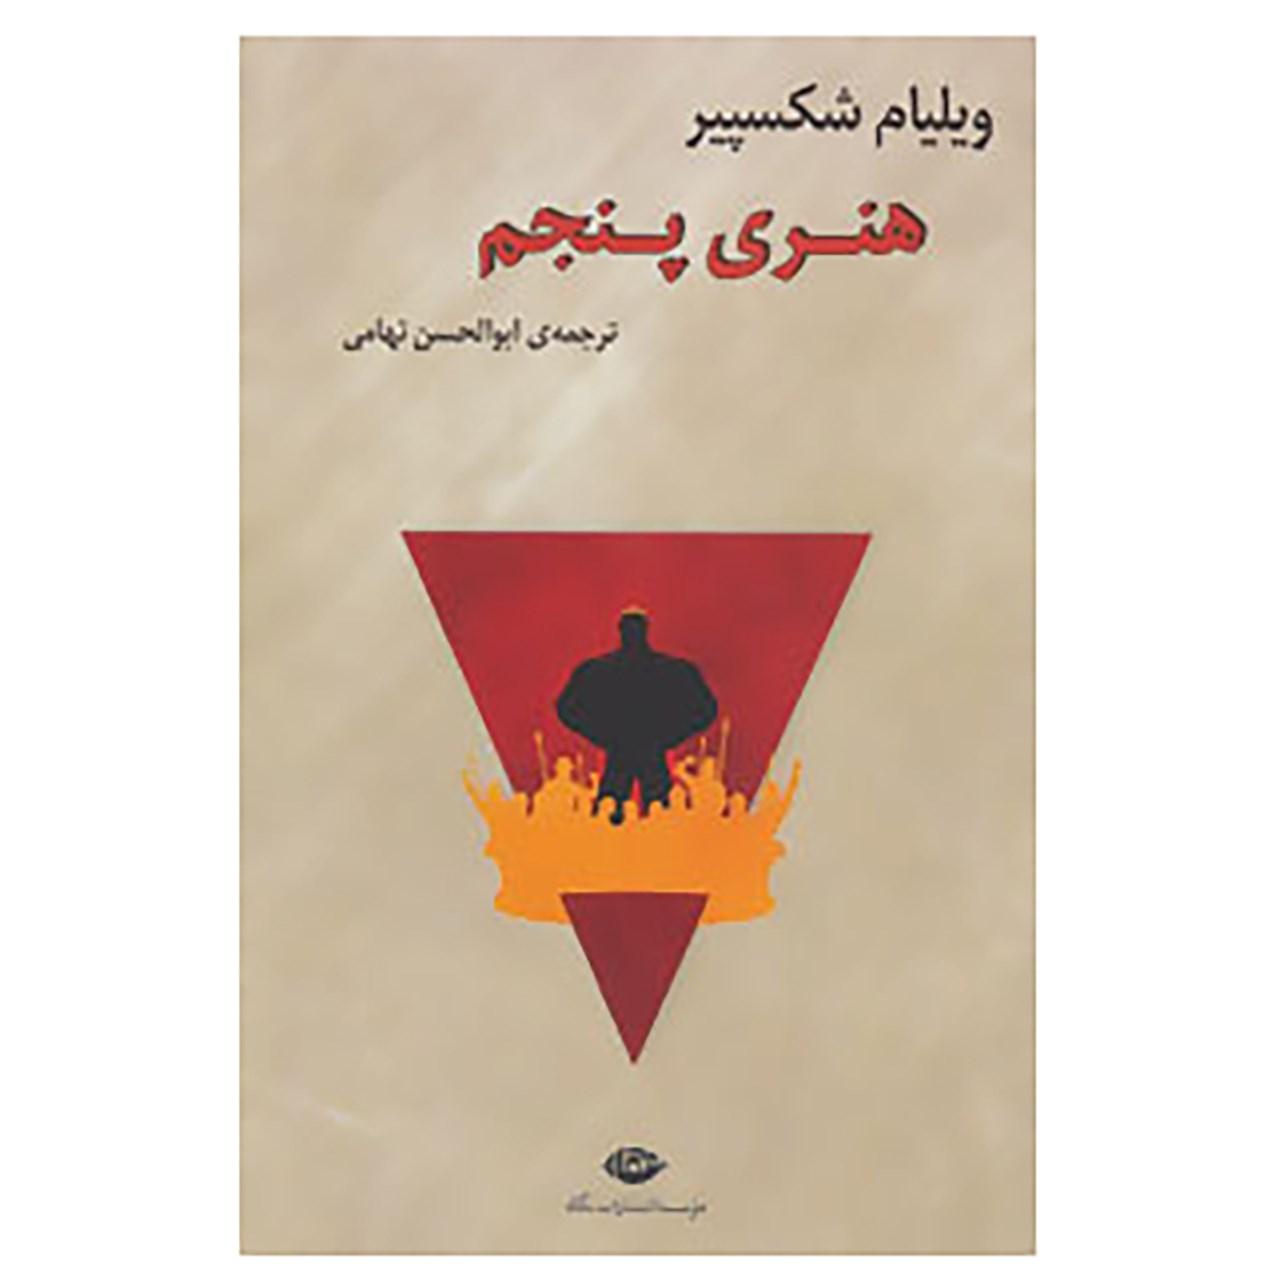 کتاب هنری پنجم اثر ویلیام شکسپیر